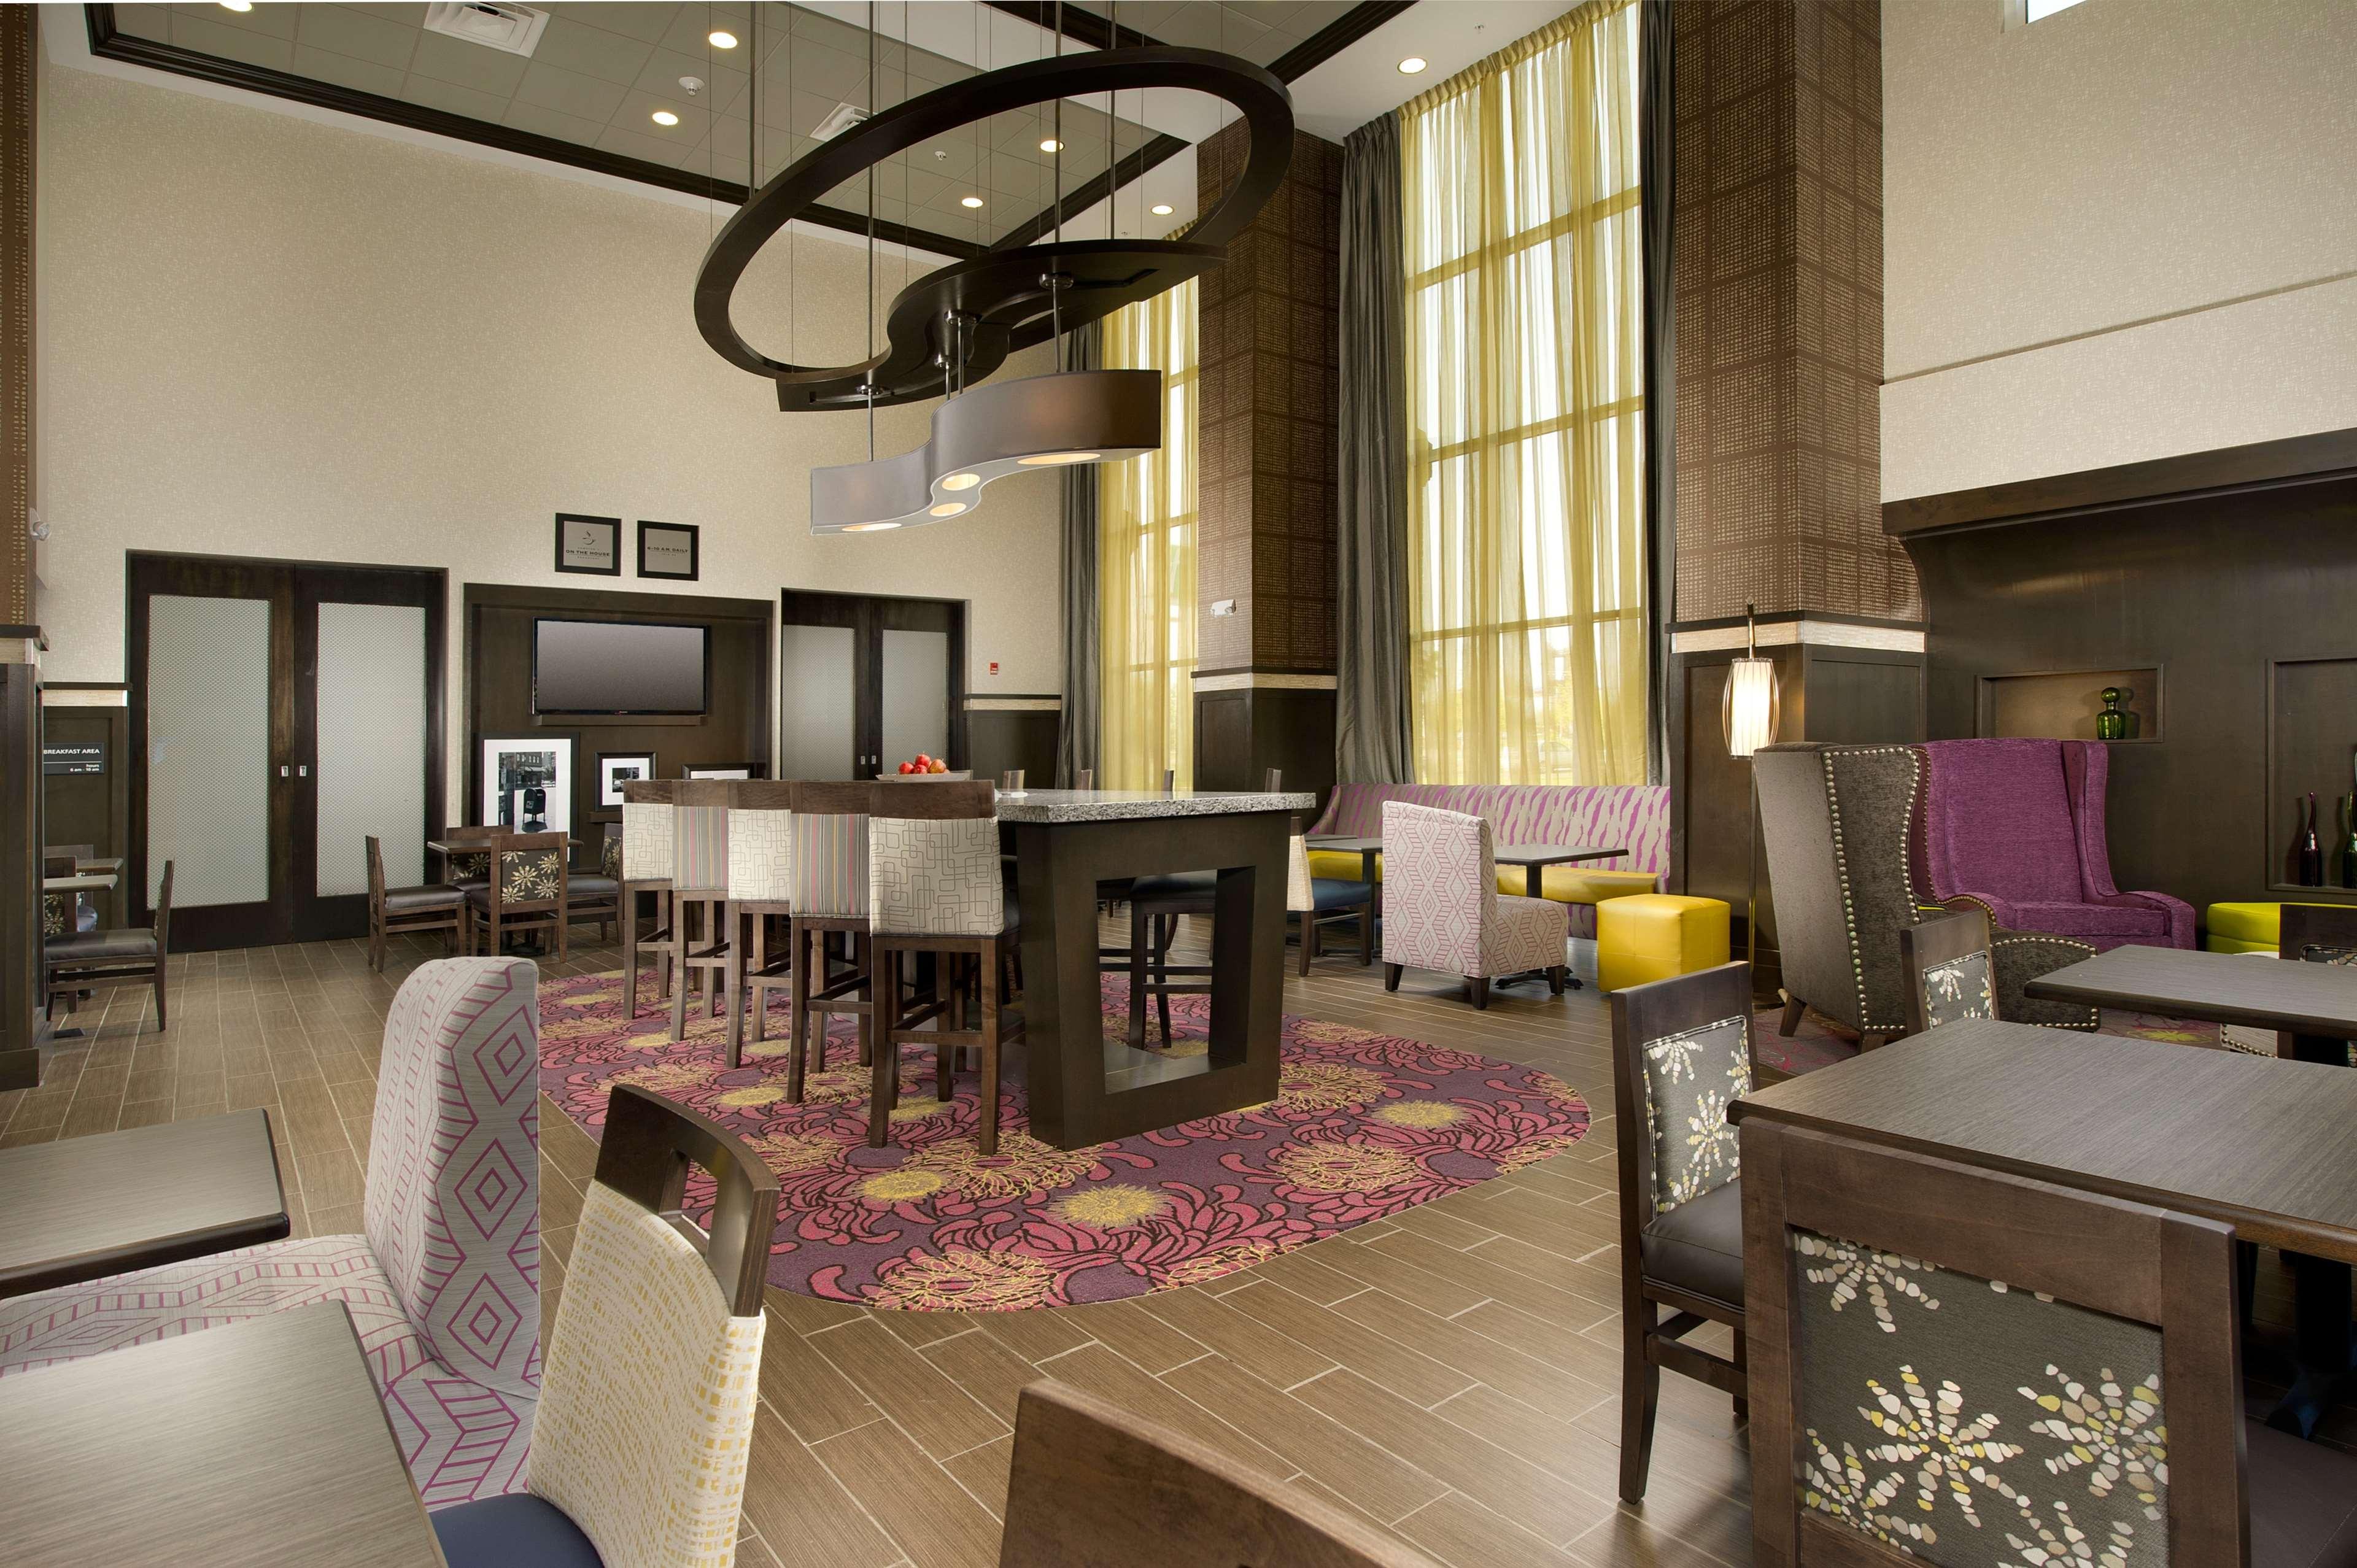 Hampton Inn & Suites Buffalo Airport image 6